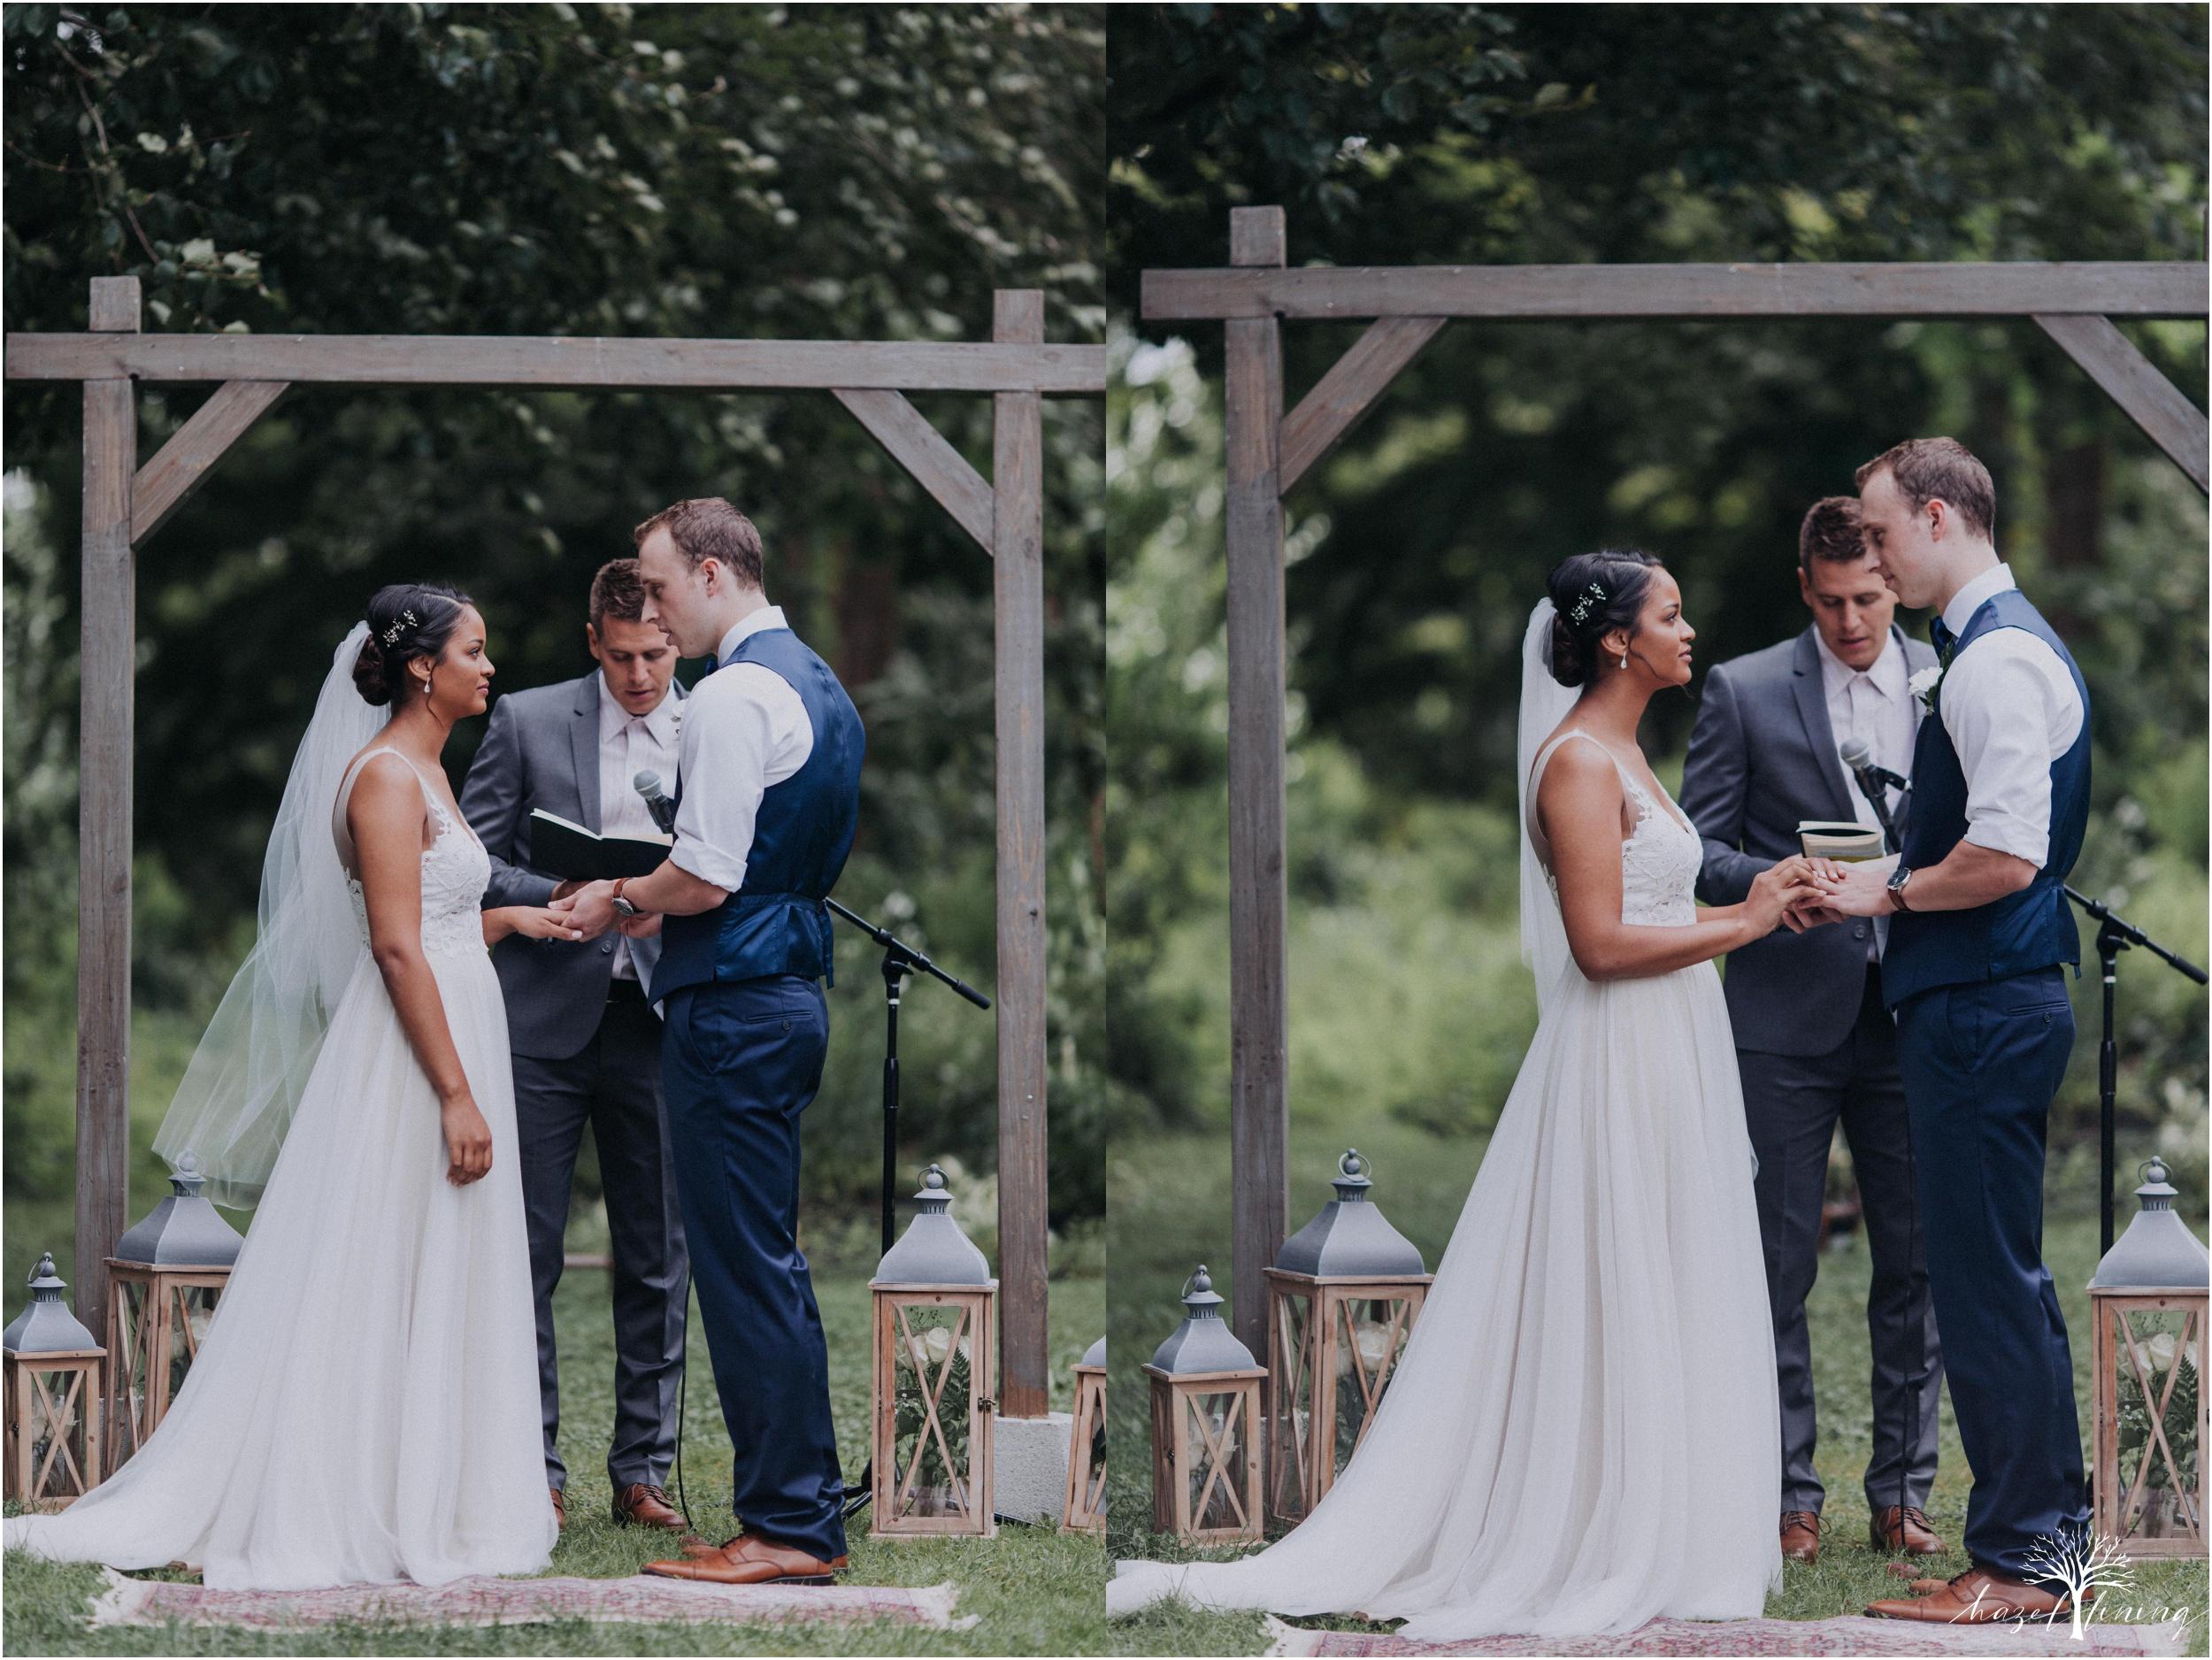 mariah-kreyling-samuel-sherratt-sherrattwiththeworld-peirce-farm-at-witch-hill-boston-massachusetts-wedding-photography-hazel-lining-travel-wedding-elopement-photography_0088.jpg